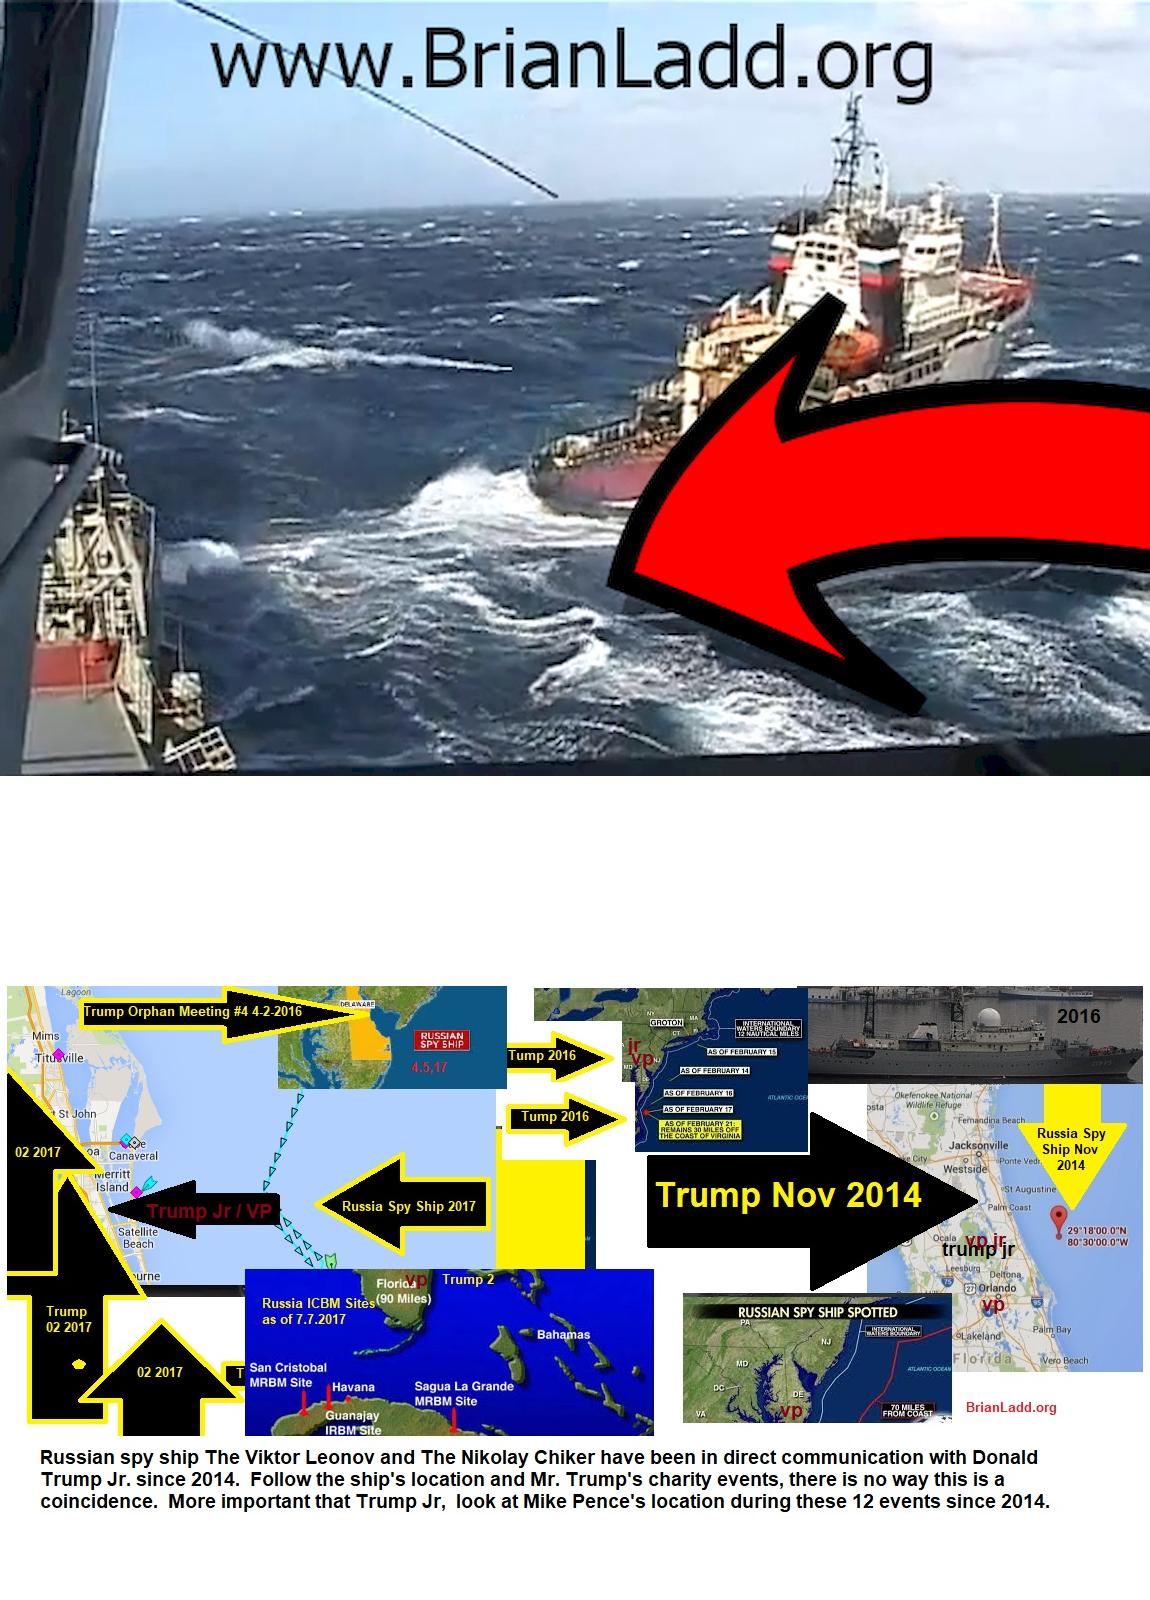 CTOlkVdUAAAA178_F_russian_spy_ship_off_the_east_coast_Donald_Trump_Jr_Russian_Spy_Sub_and_Ship_201.png